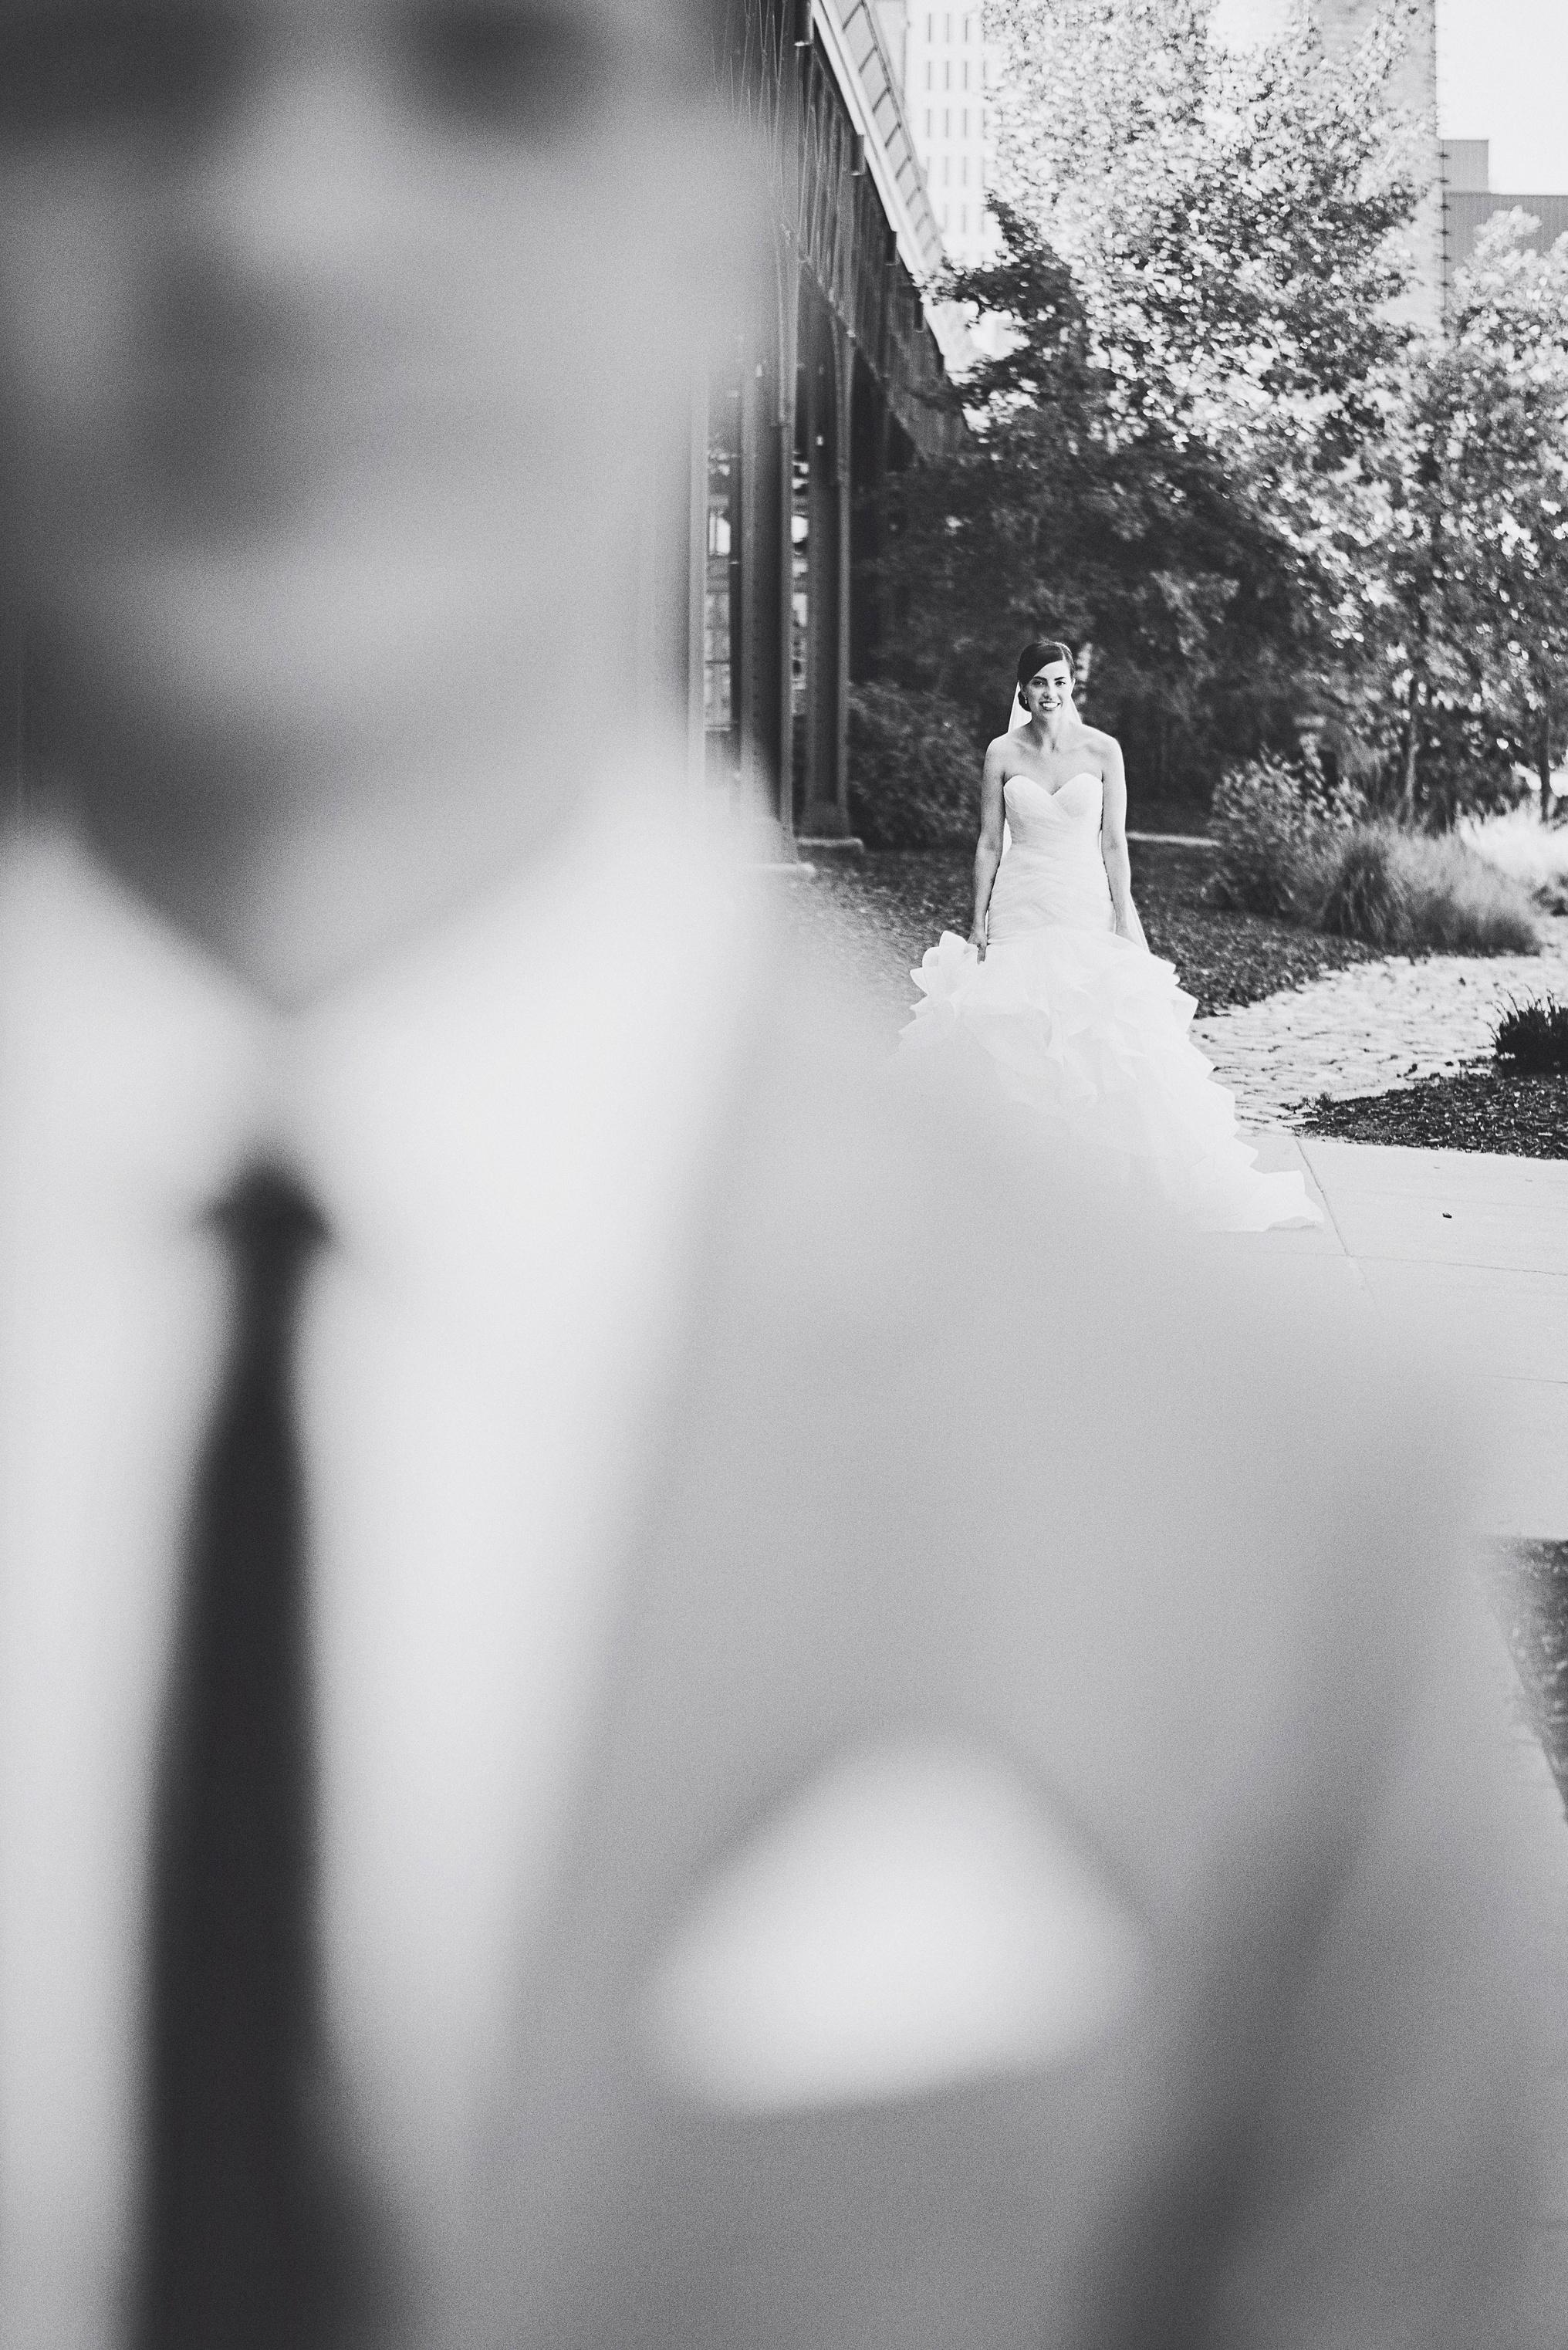 best_wedding_photography_2017_by_lucas_botz_photography_072.jpg